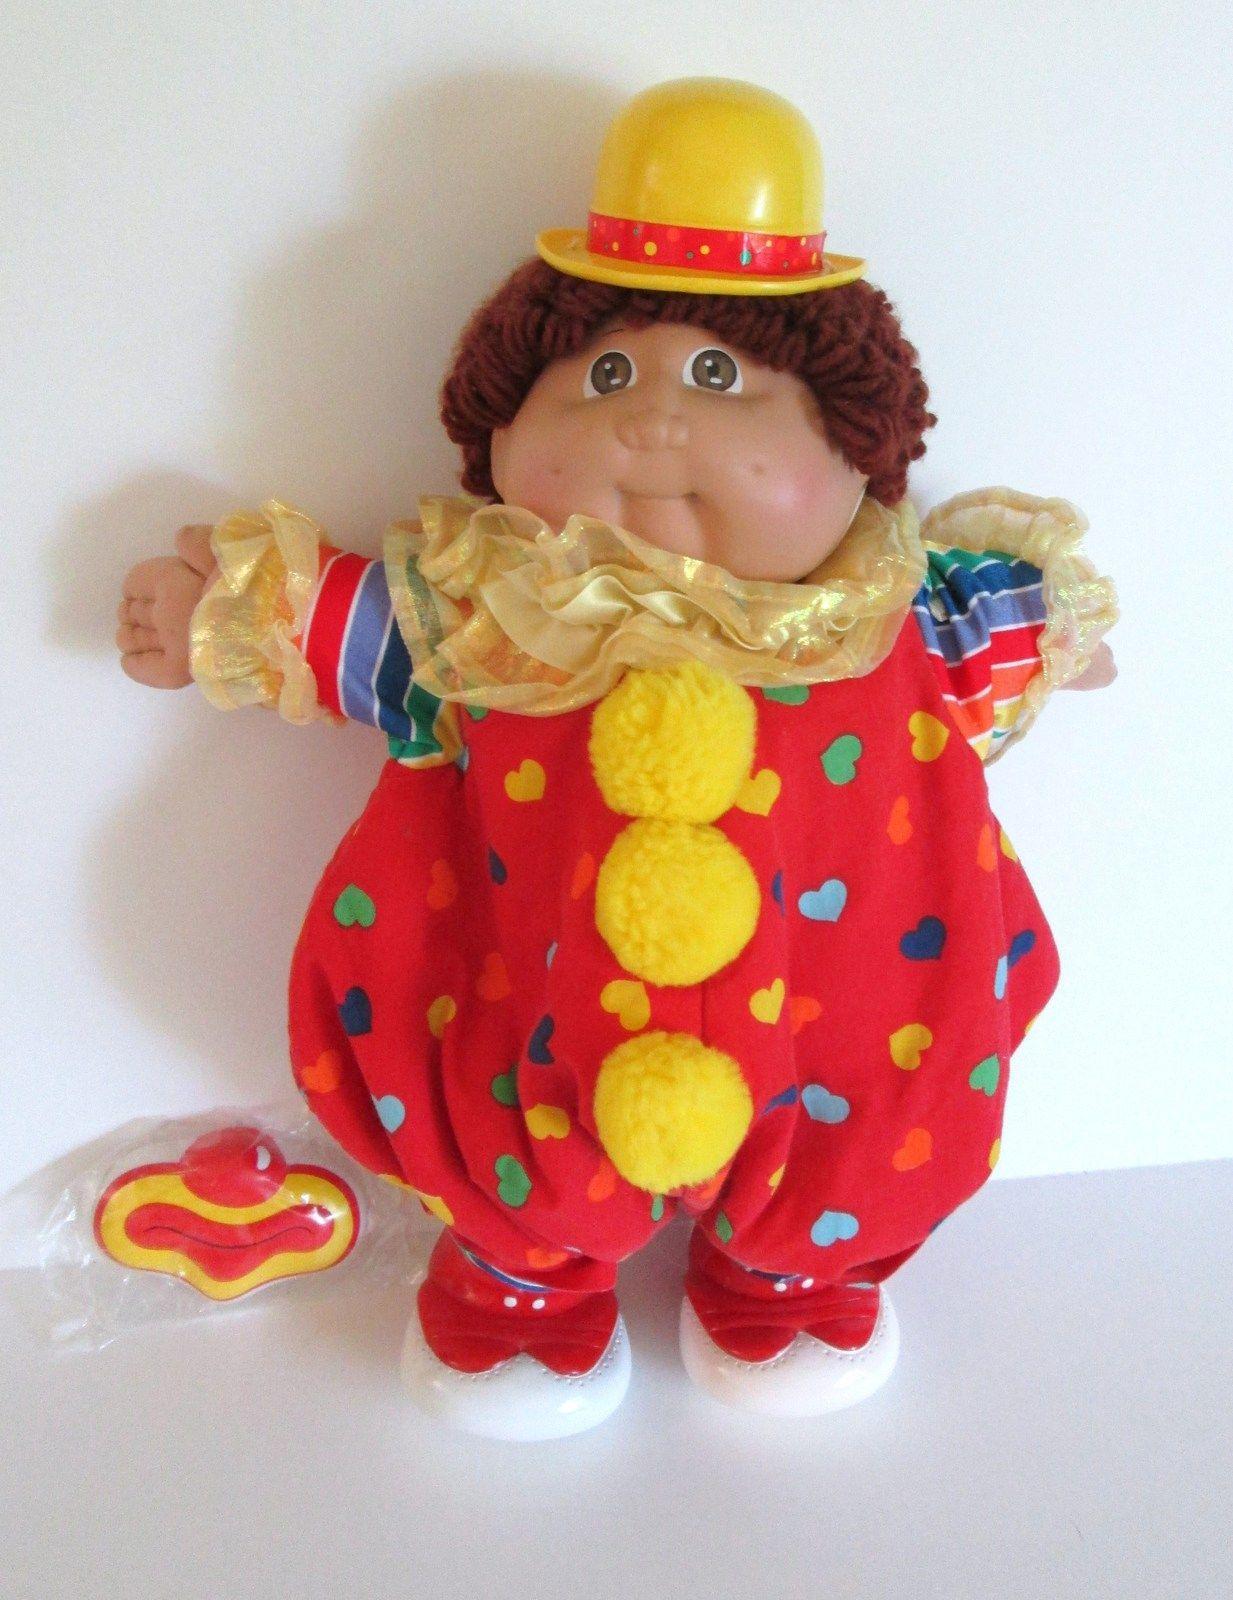 Cabbage Patch Clown Boy Doll 1984 Coleco Hm 2 Auburn Loop Hair Hazel Eyes Vintage Cabbage Patch Dolls Black Cabbage Patch Doll Cabbage Patch Dolls